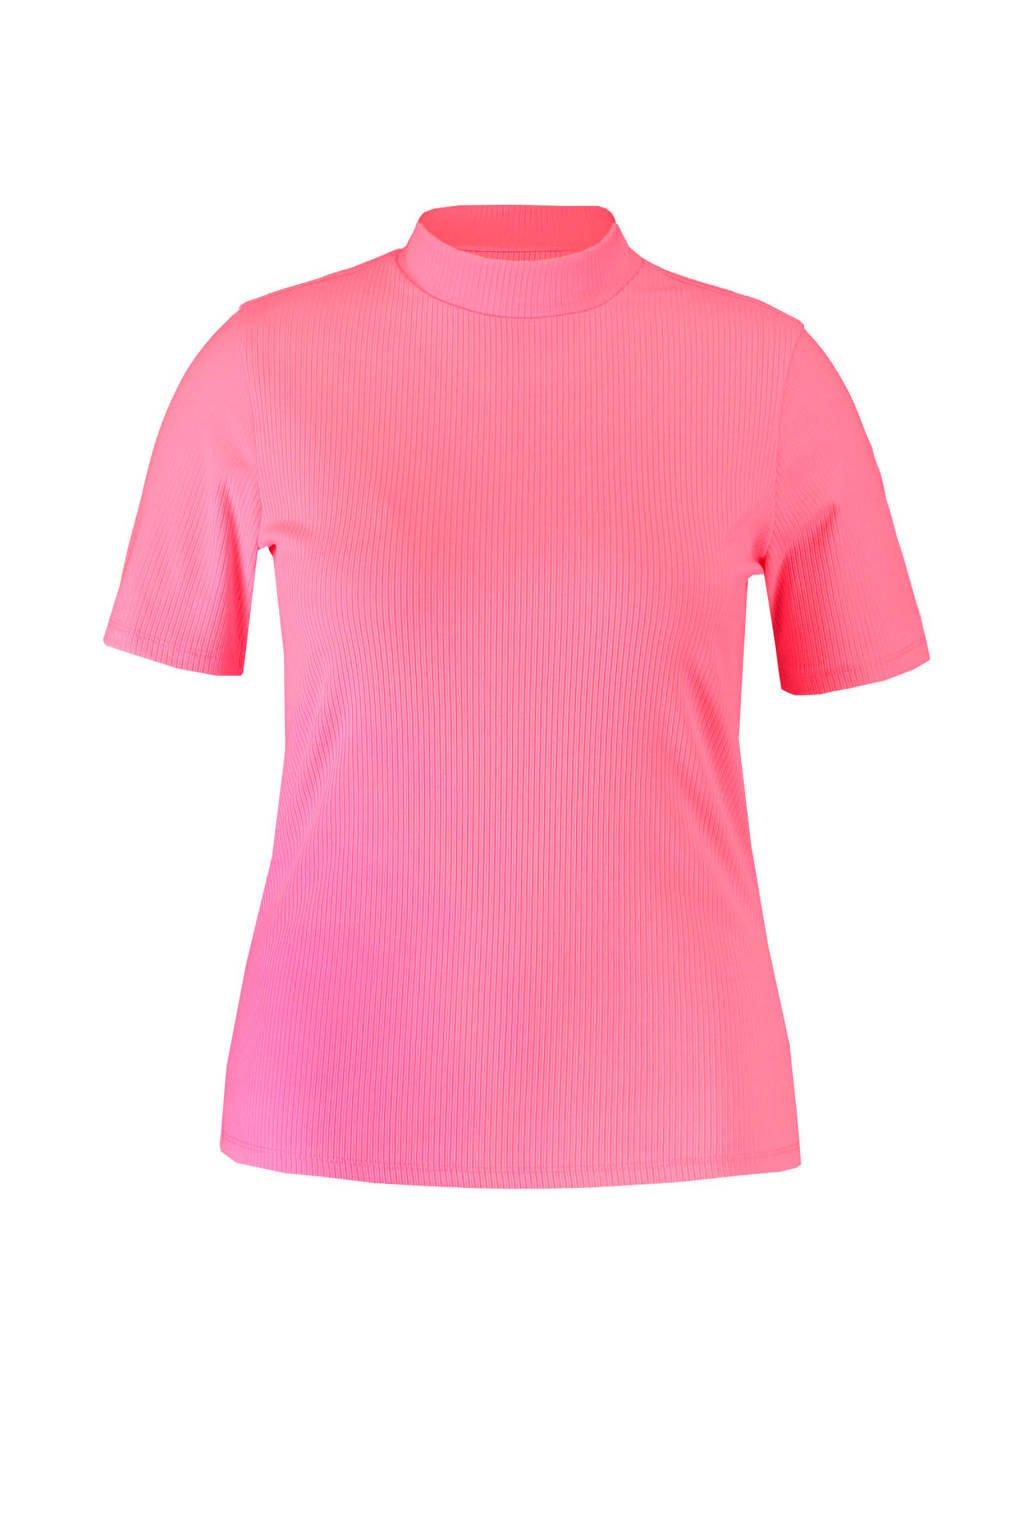 MS Mode ribgebreide top roze, Roze